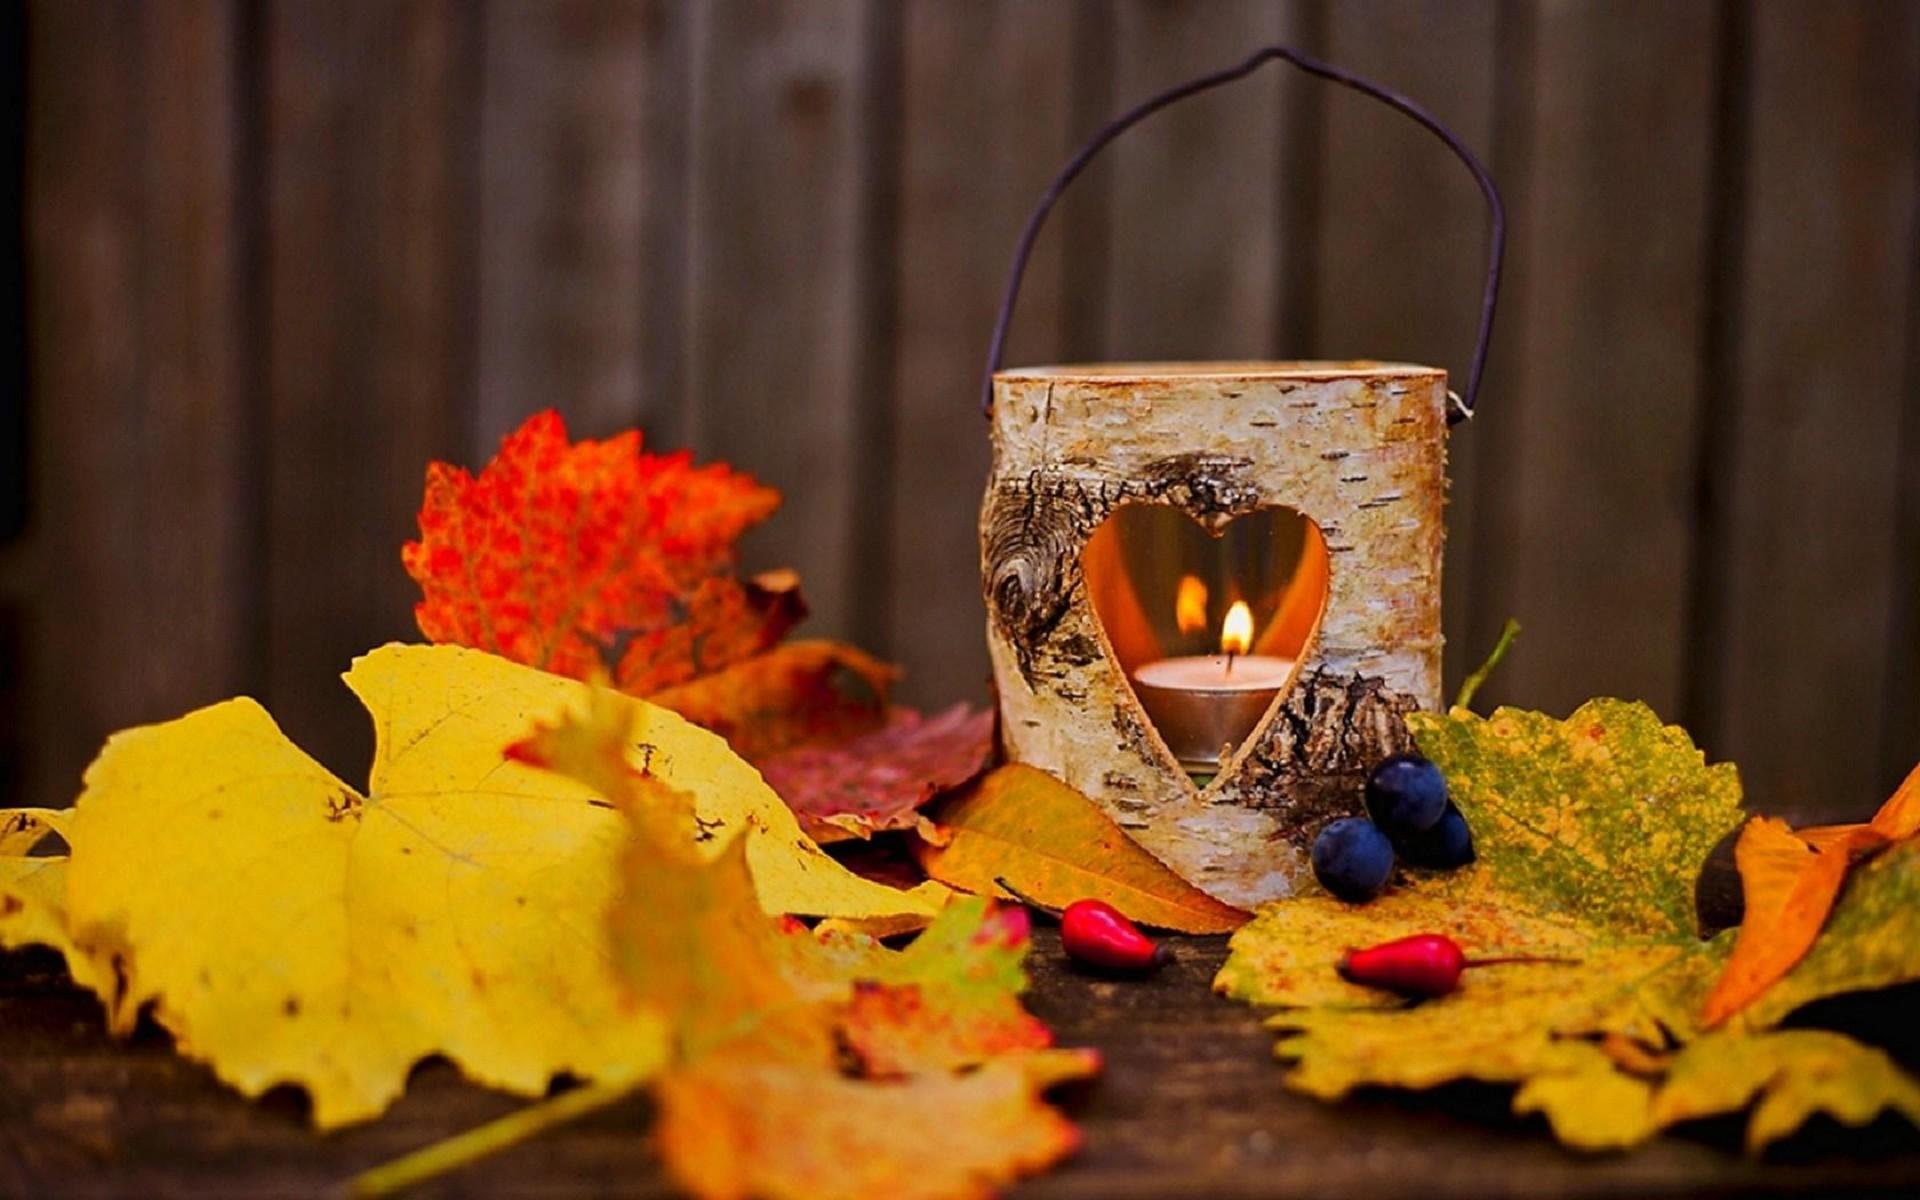 Candle light autumn wallpaper